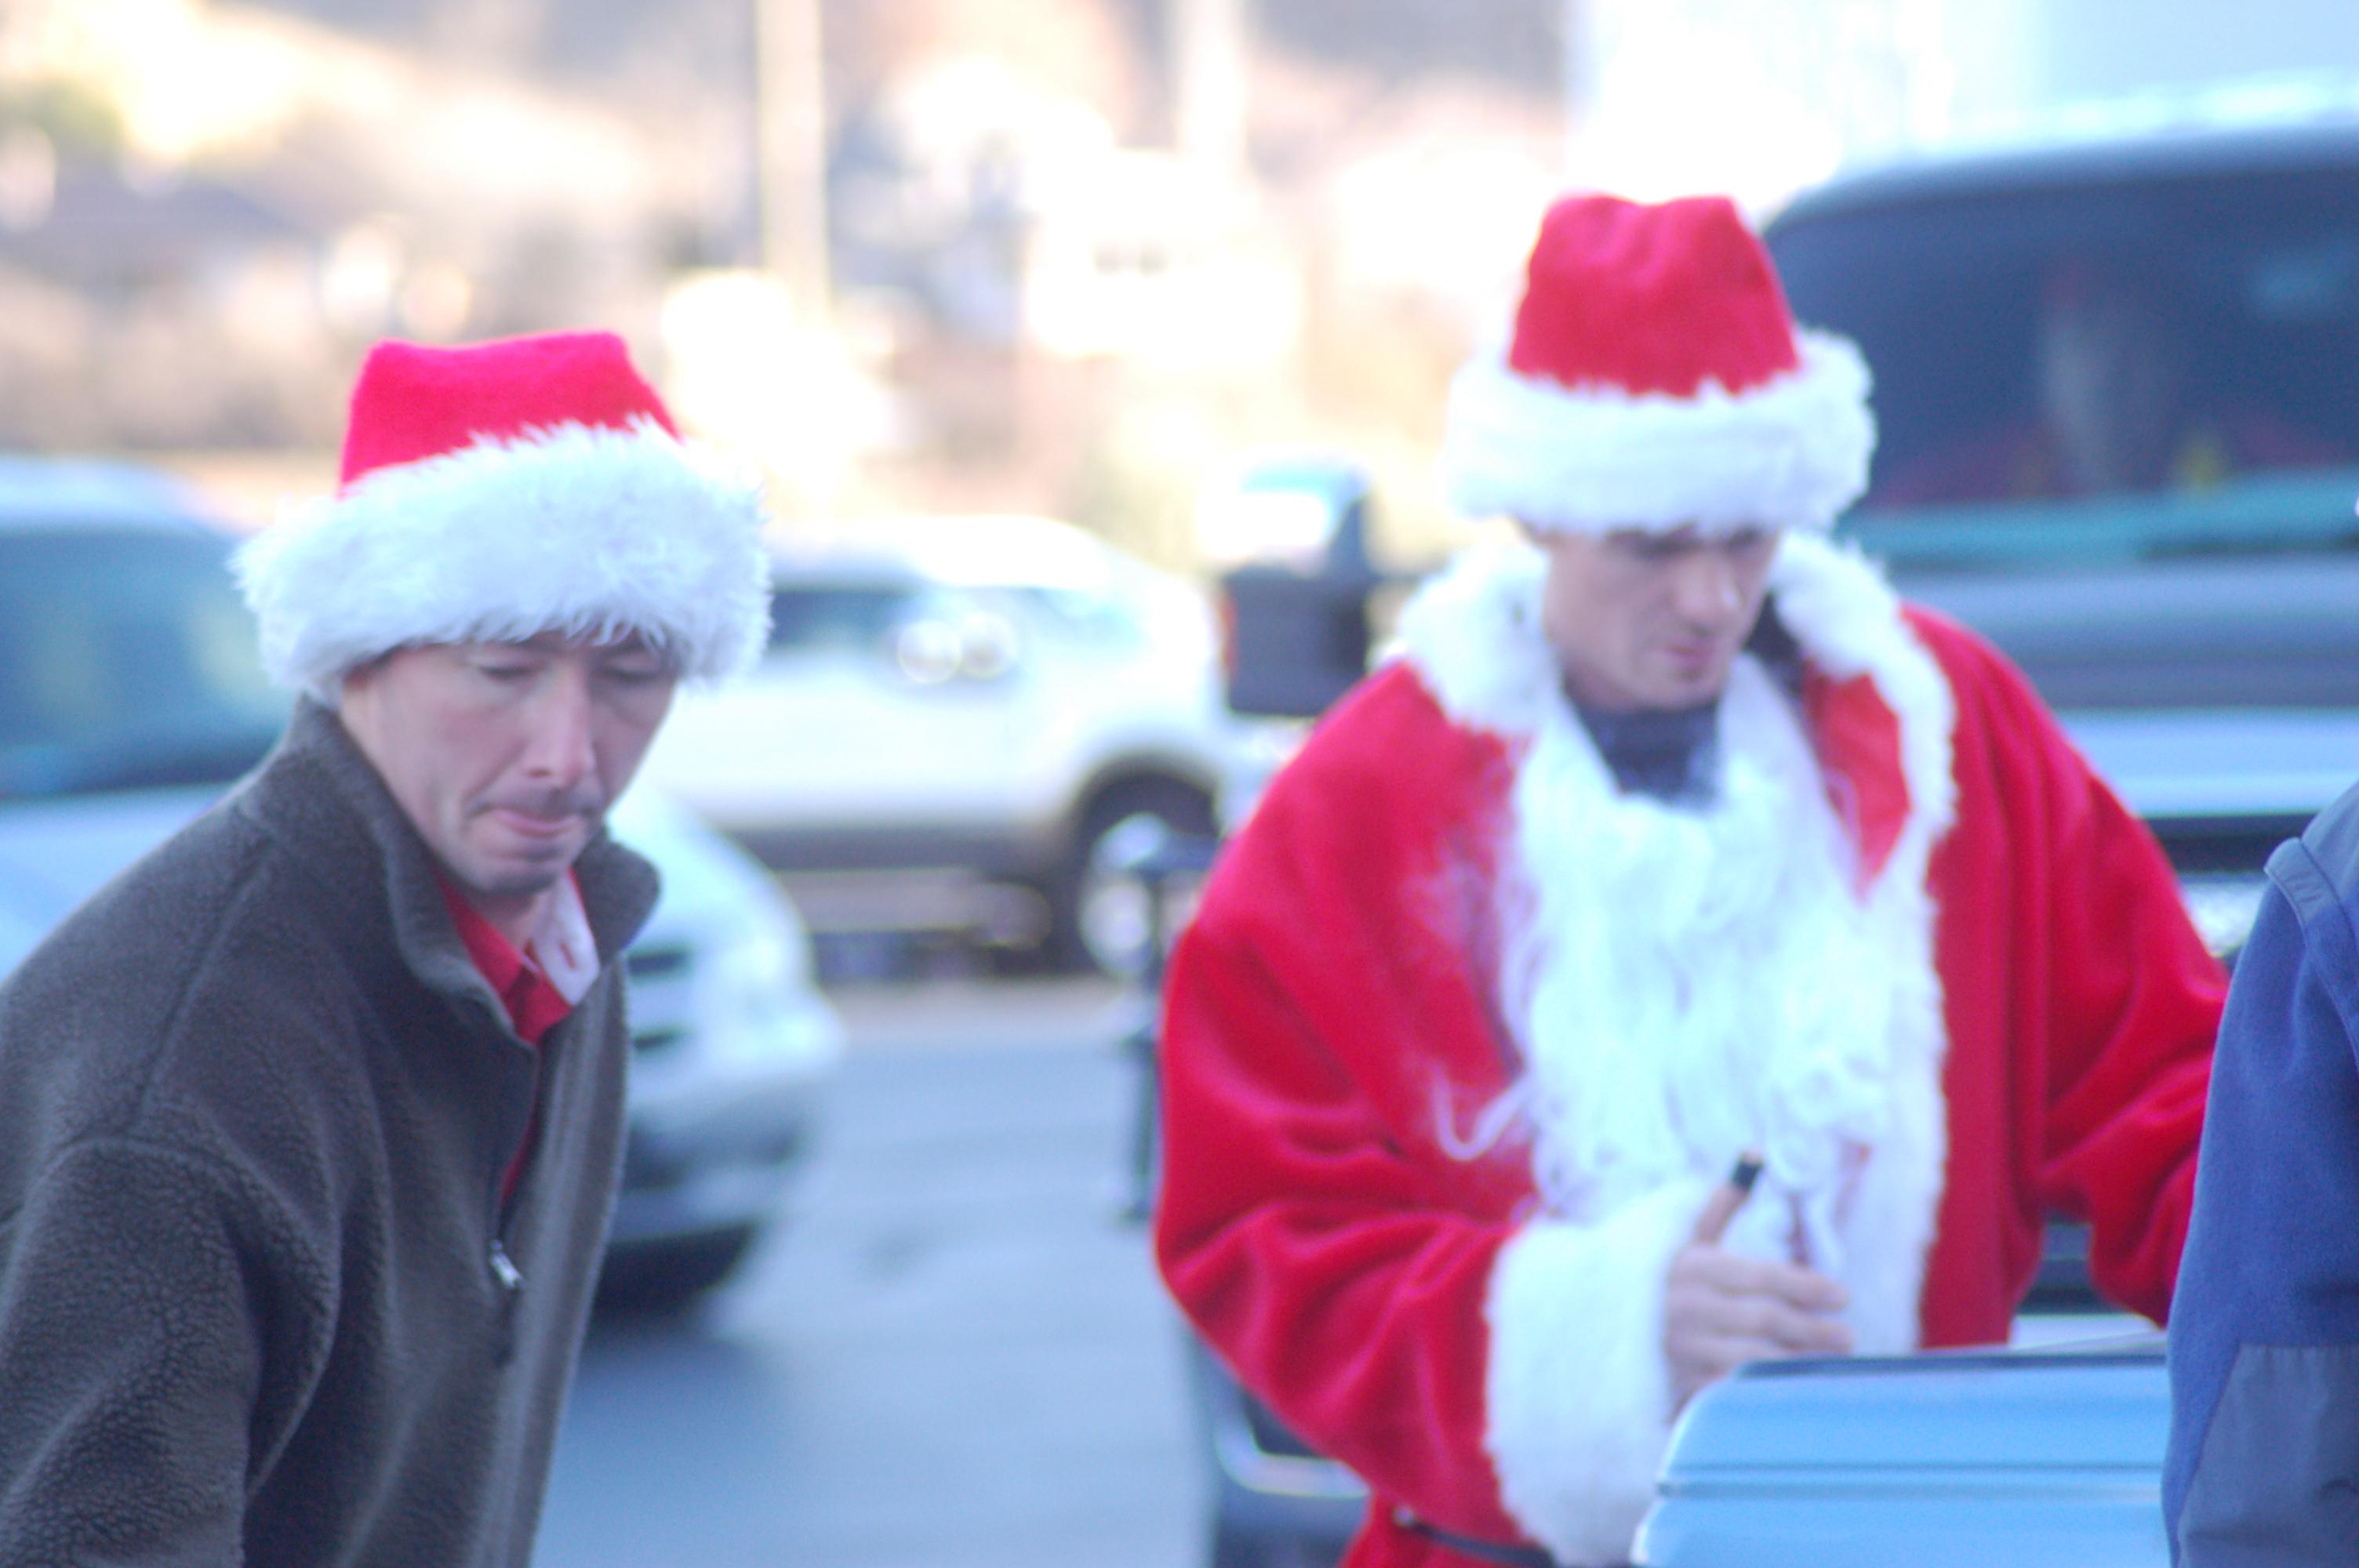 Christmas Volunteering 2020 Utah A community of Santas deliver Christmas cheer to almost 500